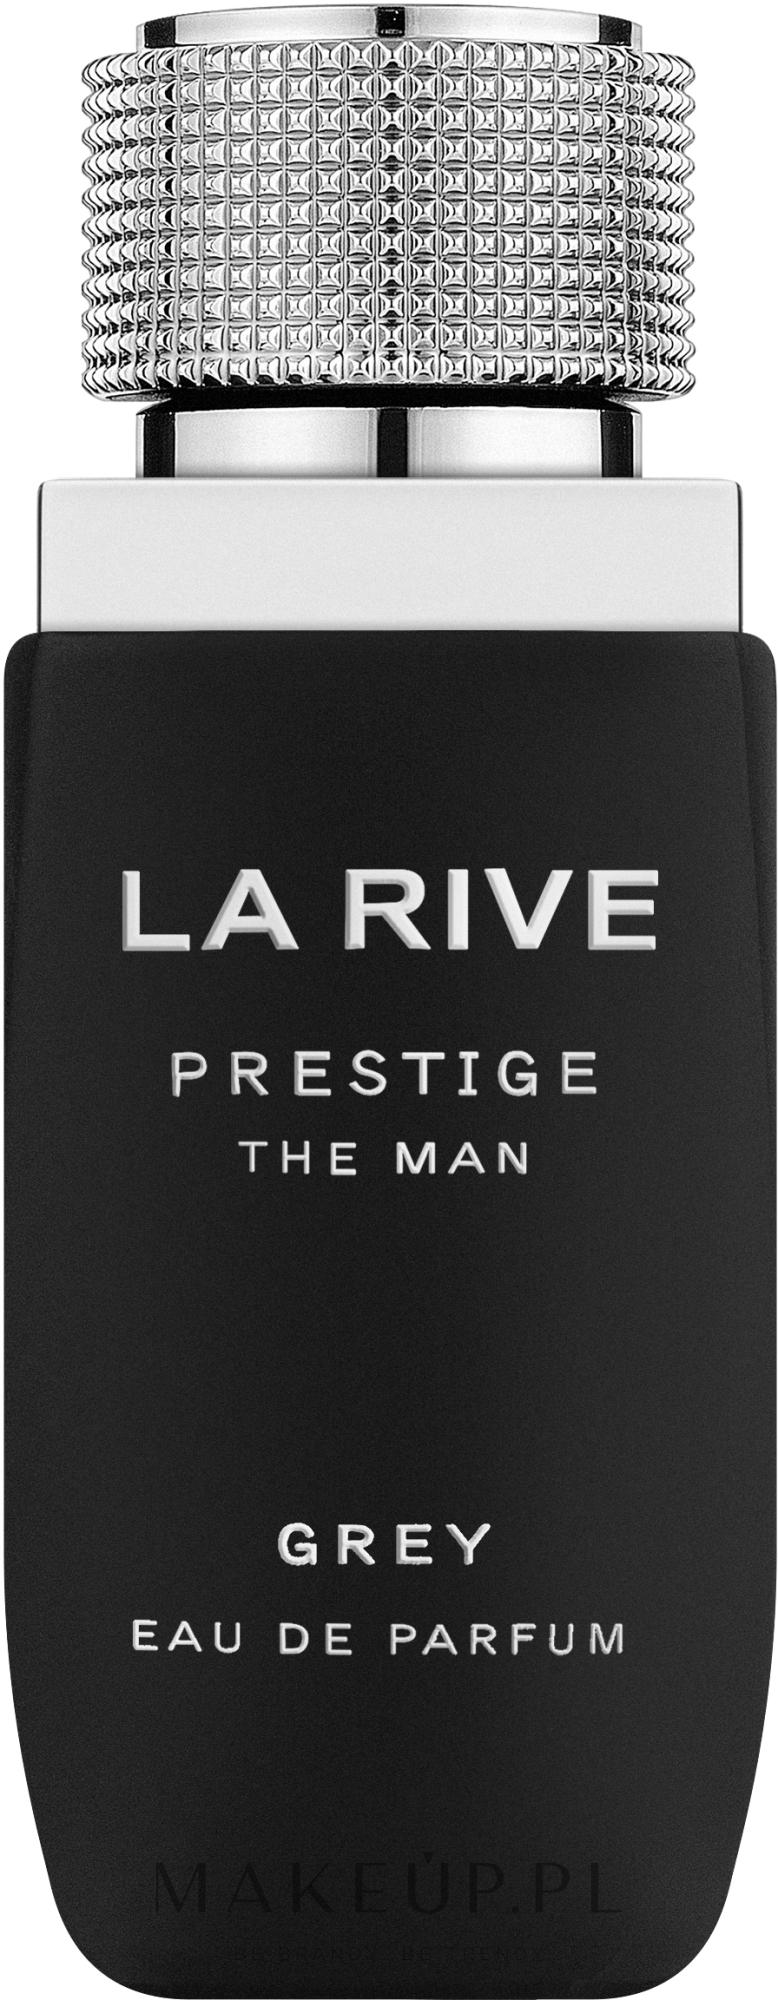 la rive prestige - the man grey